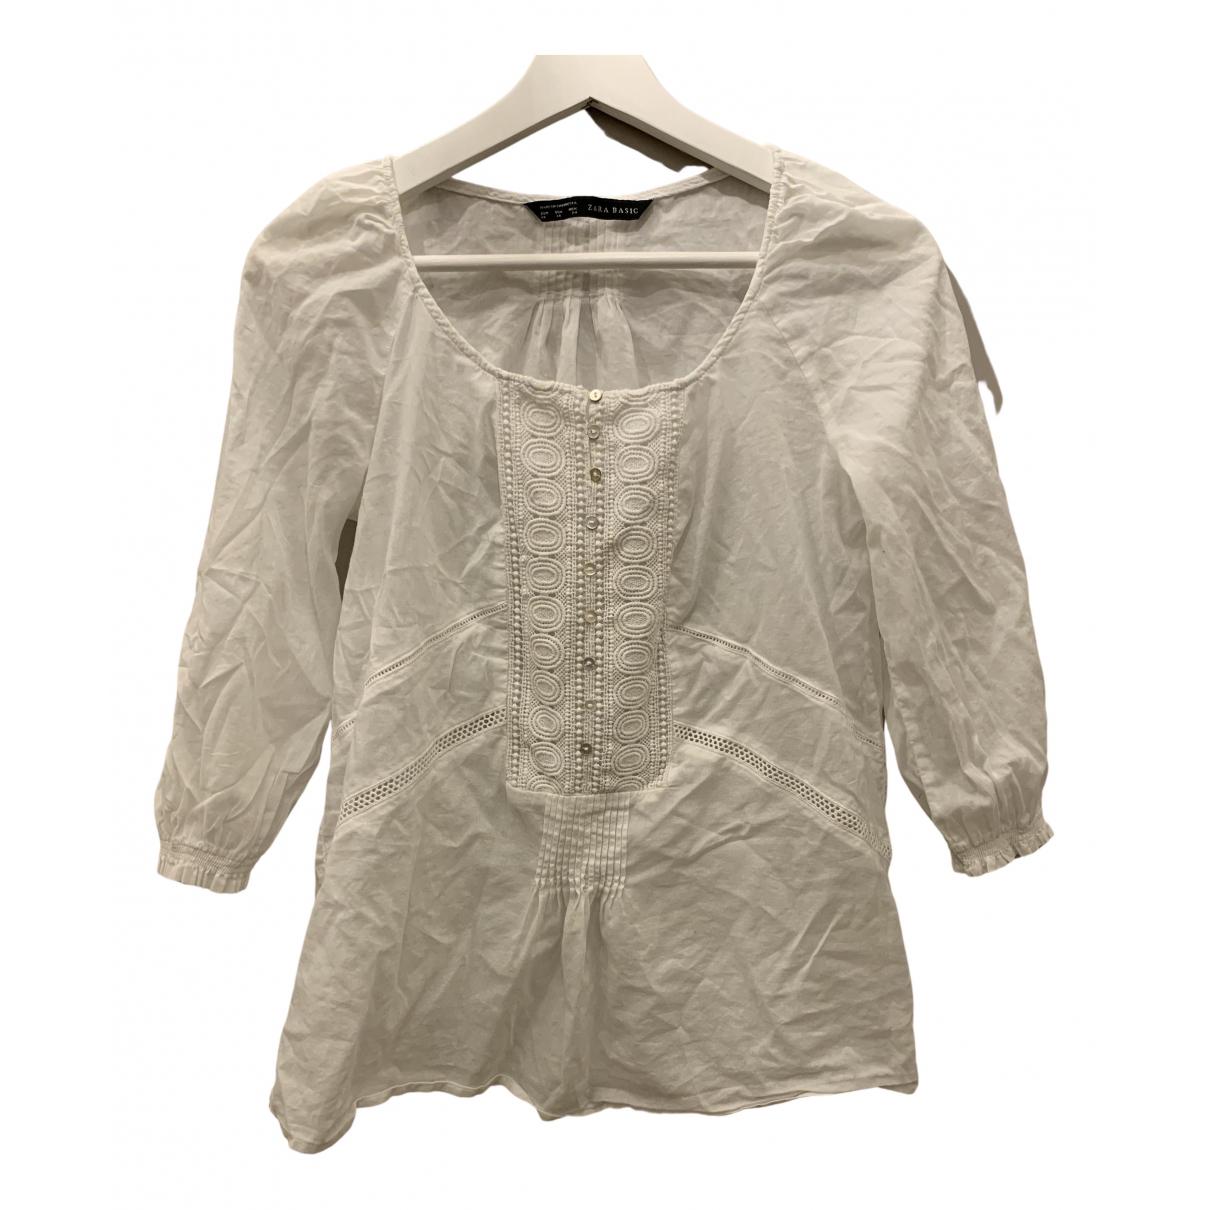 Zara N White Cotton  top for Women XS International